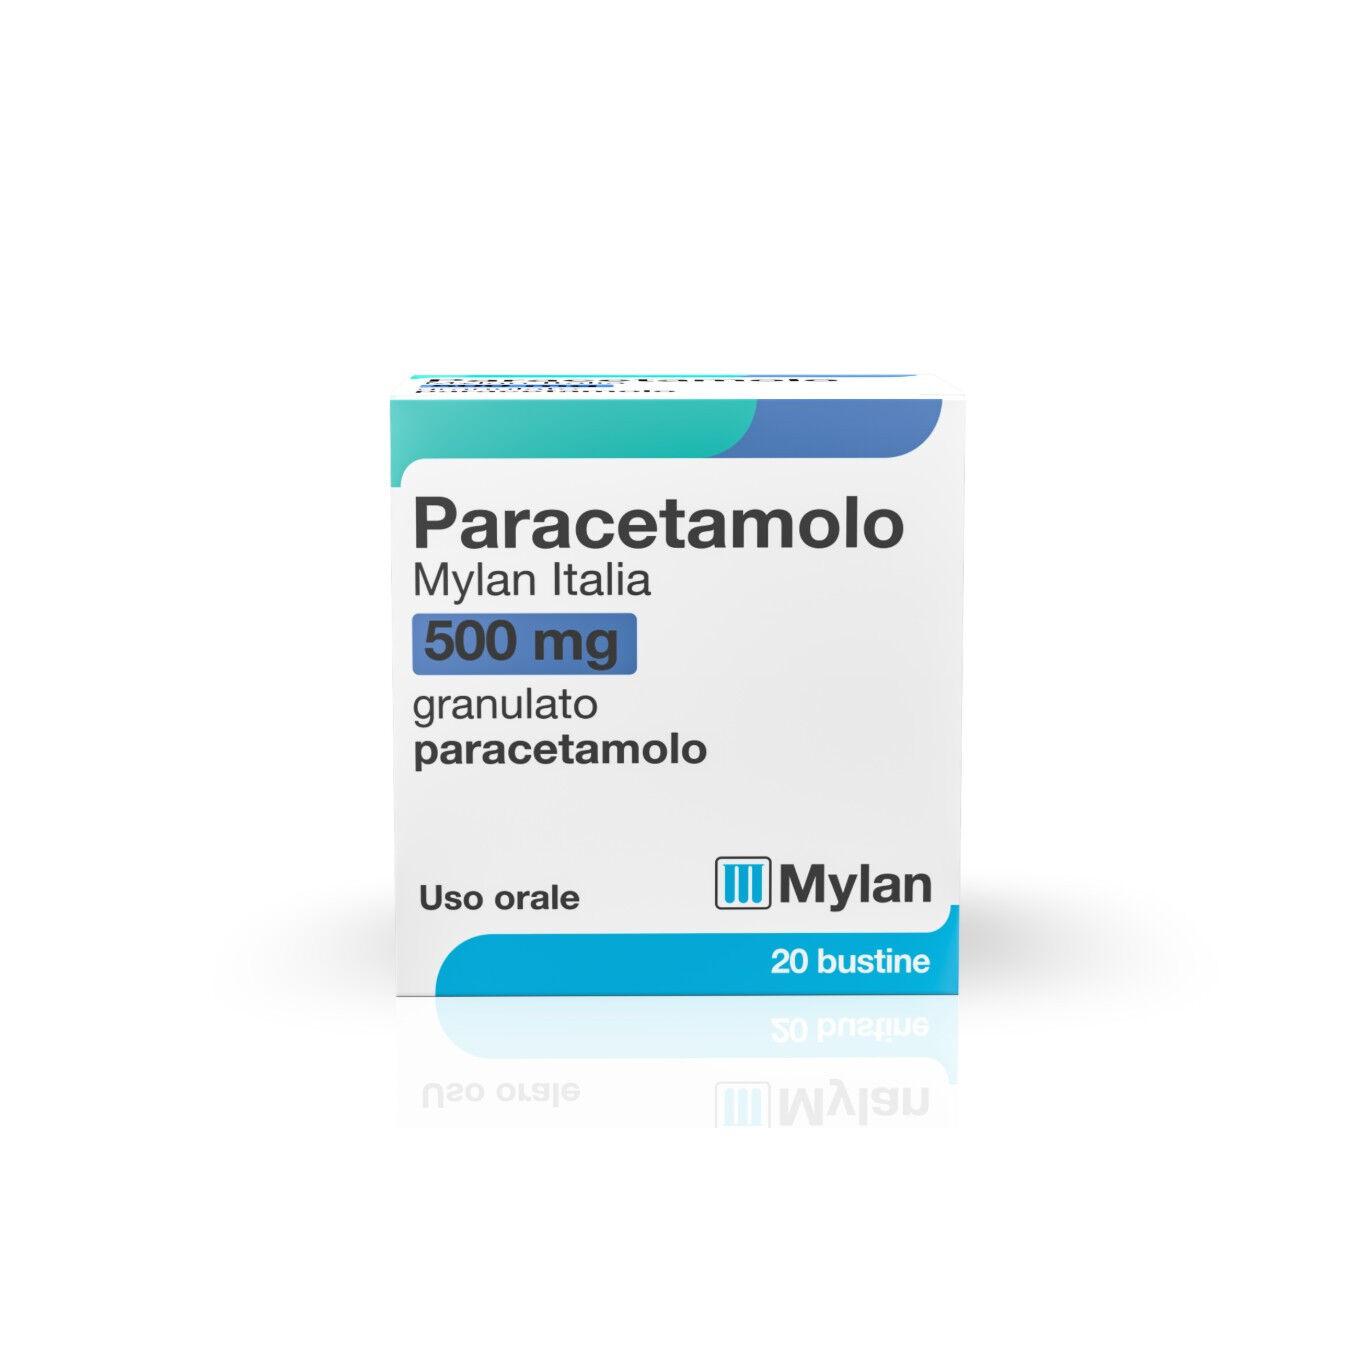 Mylan Paracetamolo 20 bustine 500mg